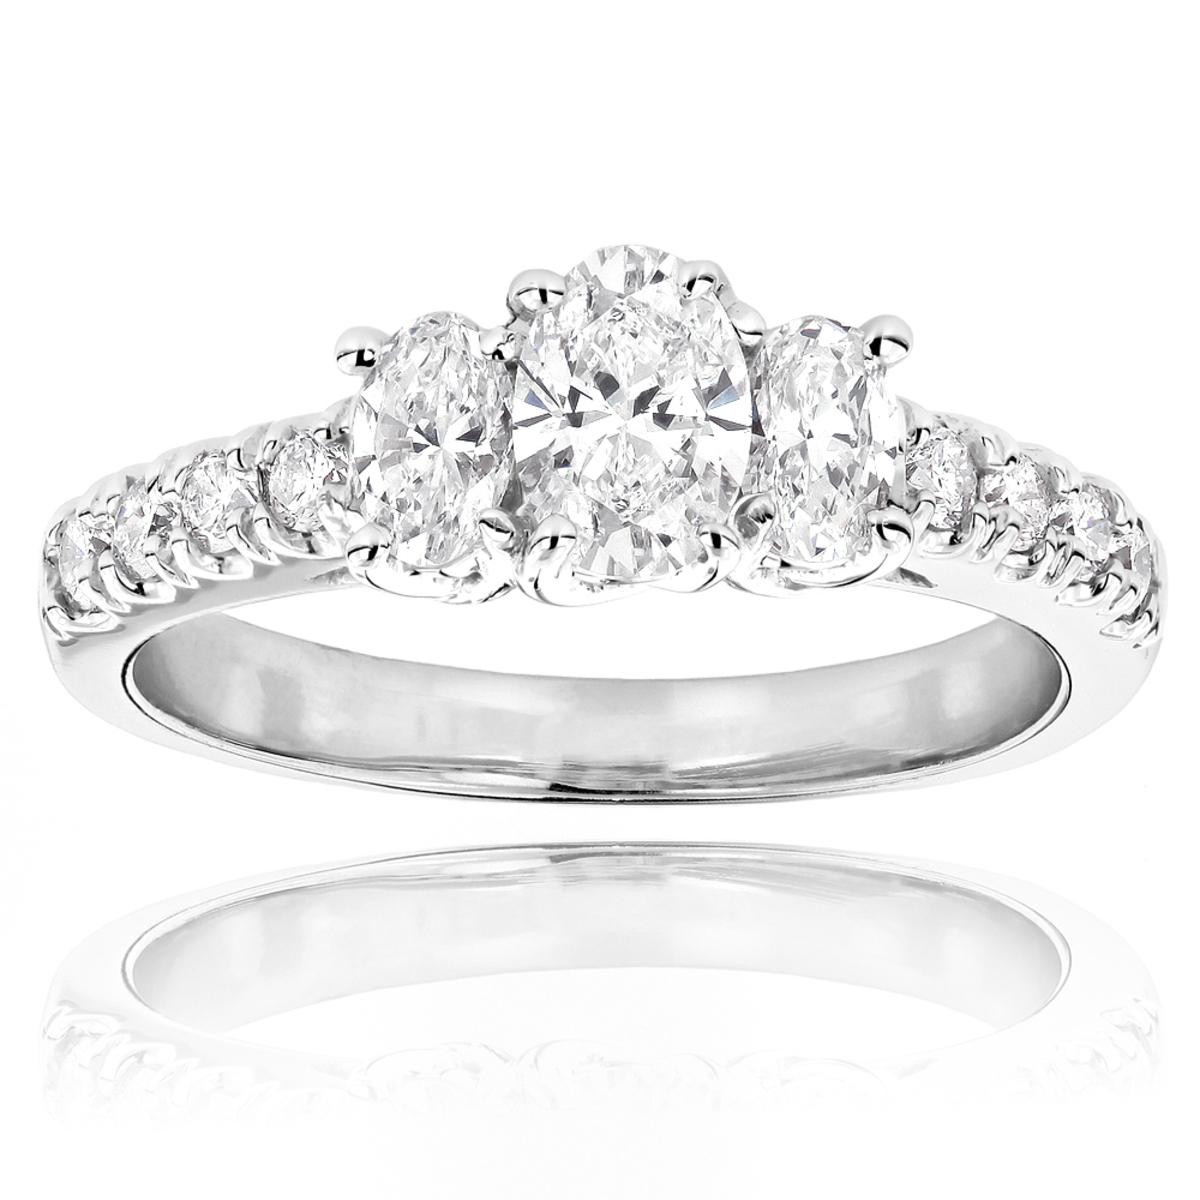 14K Gold Three Stone Diamond Engagement Ring 1.20ct